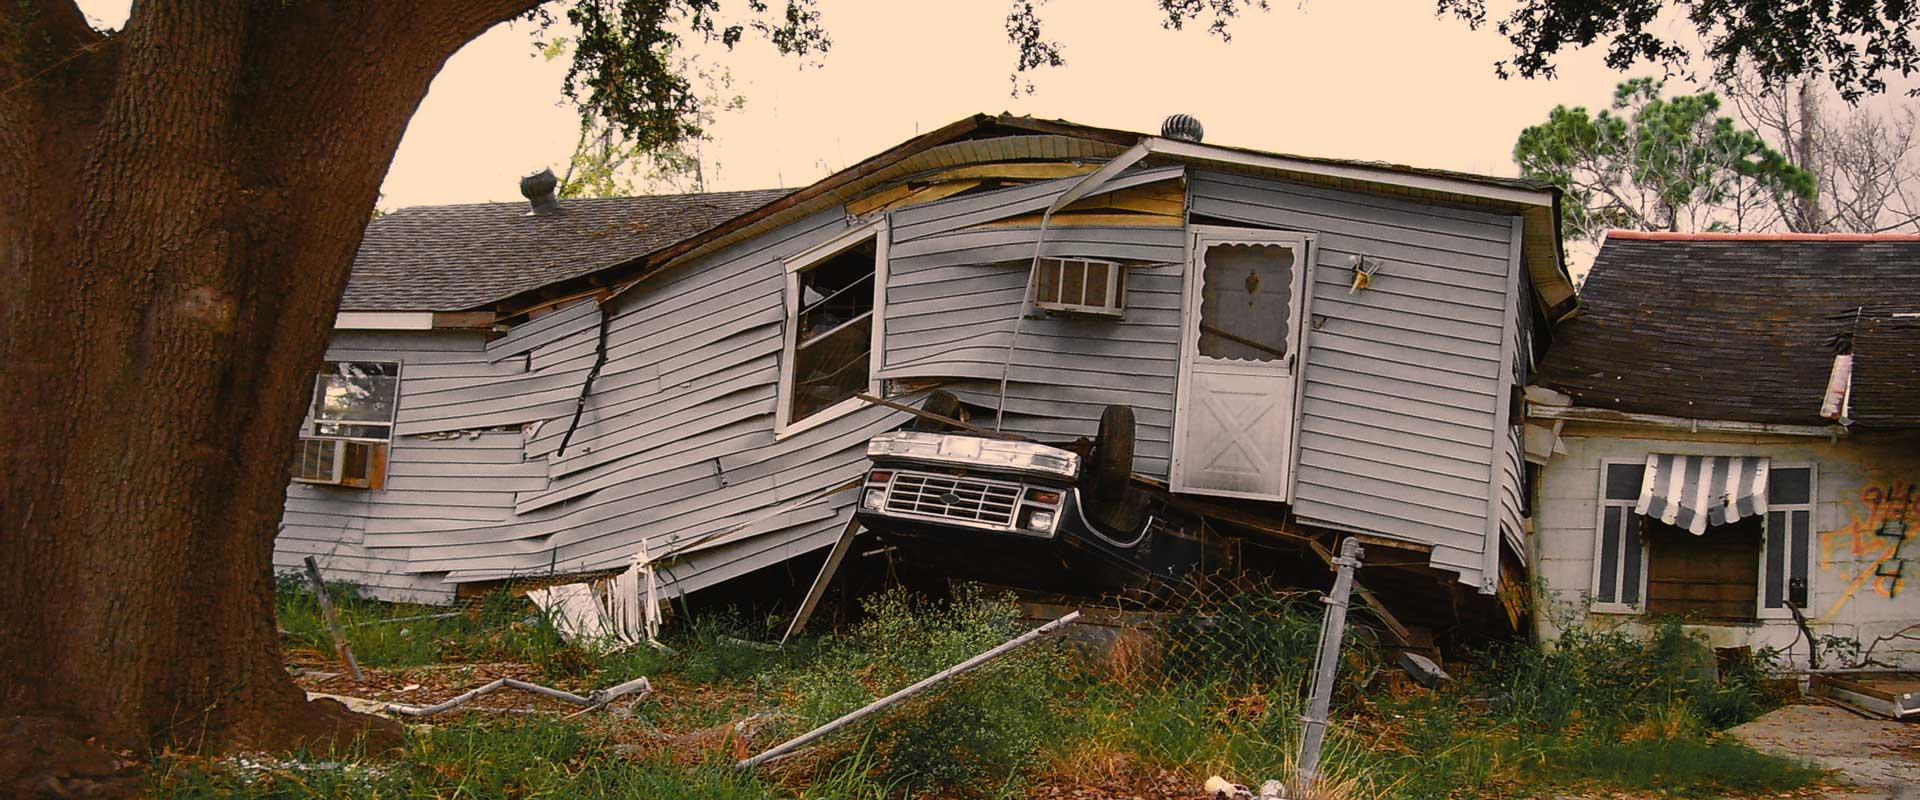 Saffir-Simpson Skala (Hurricane-Stärken)